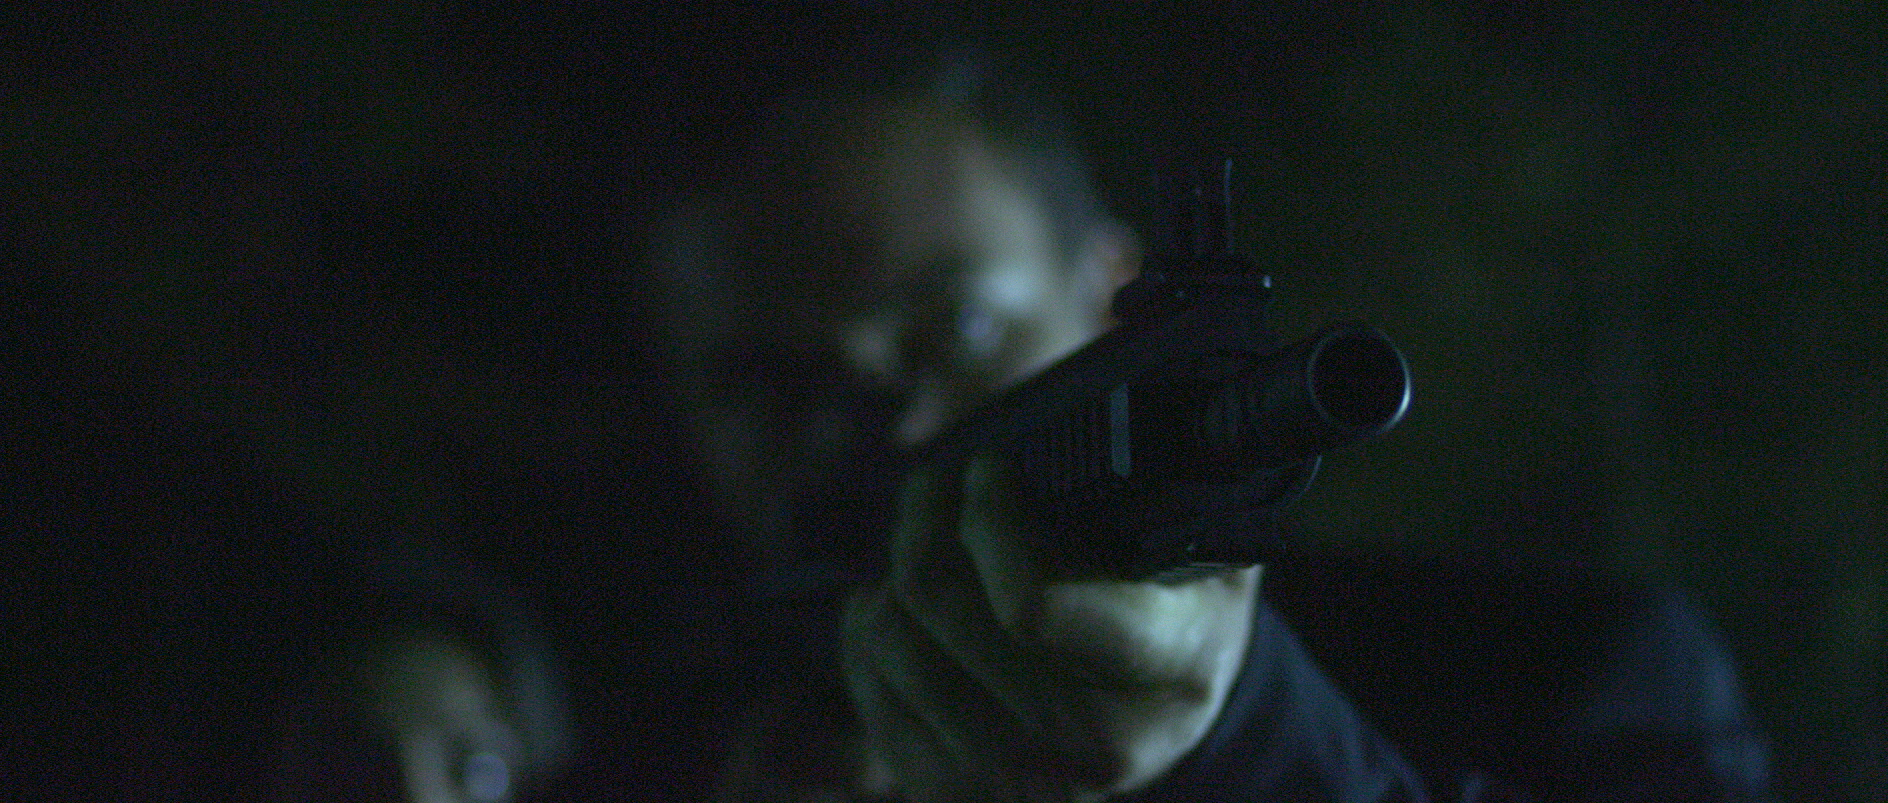 513 Mark points his gun.png